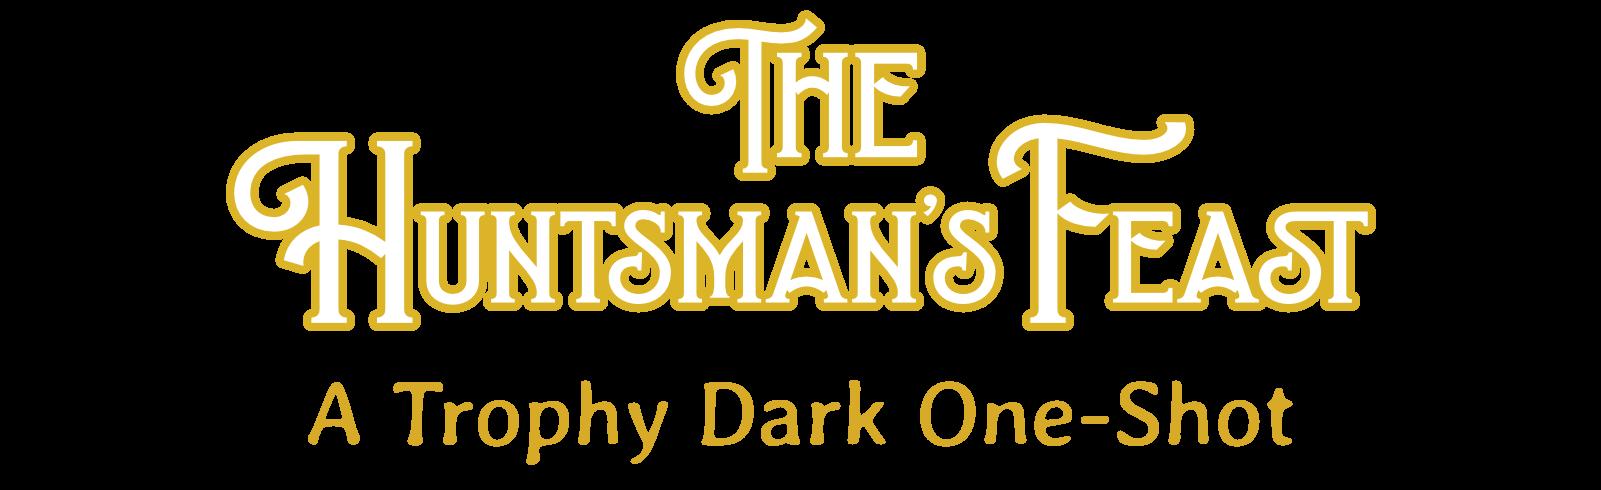 The Huntsman's Feast